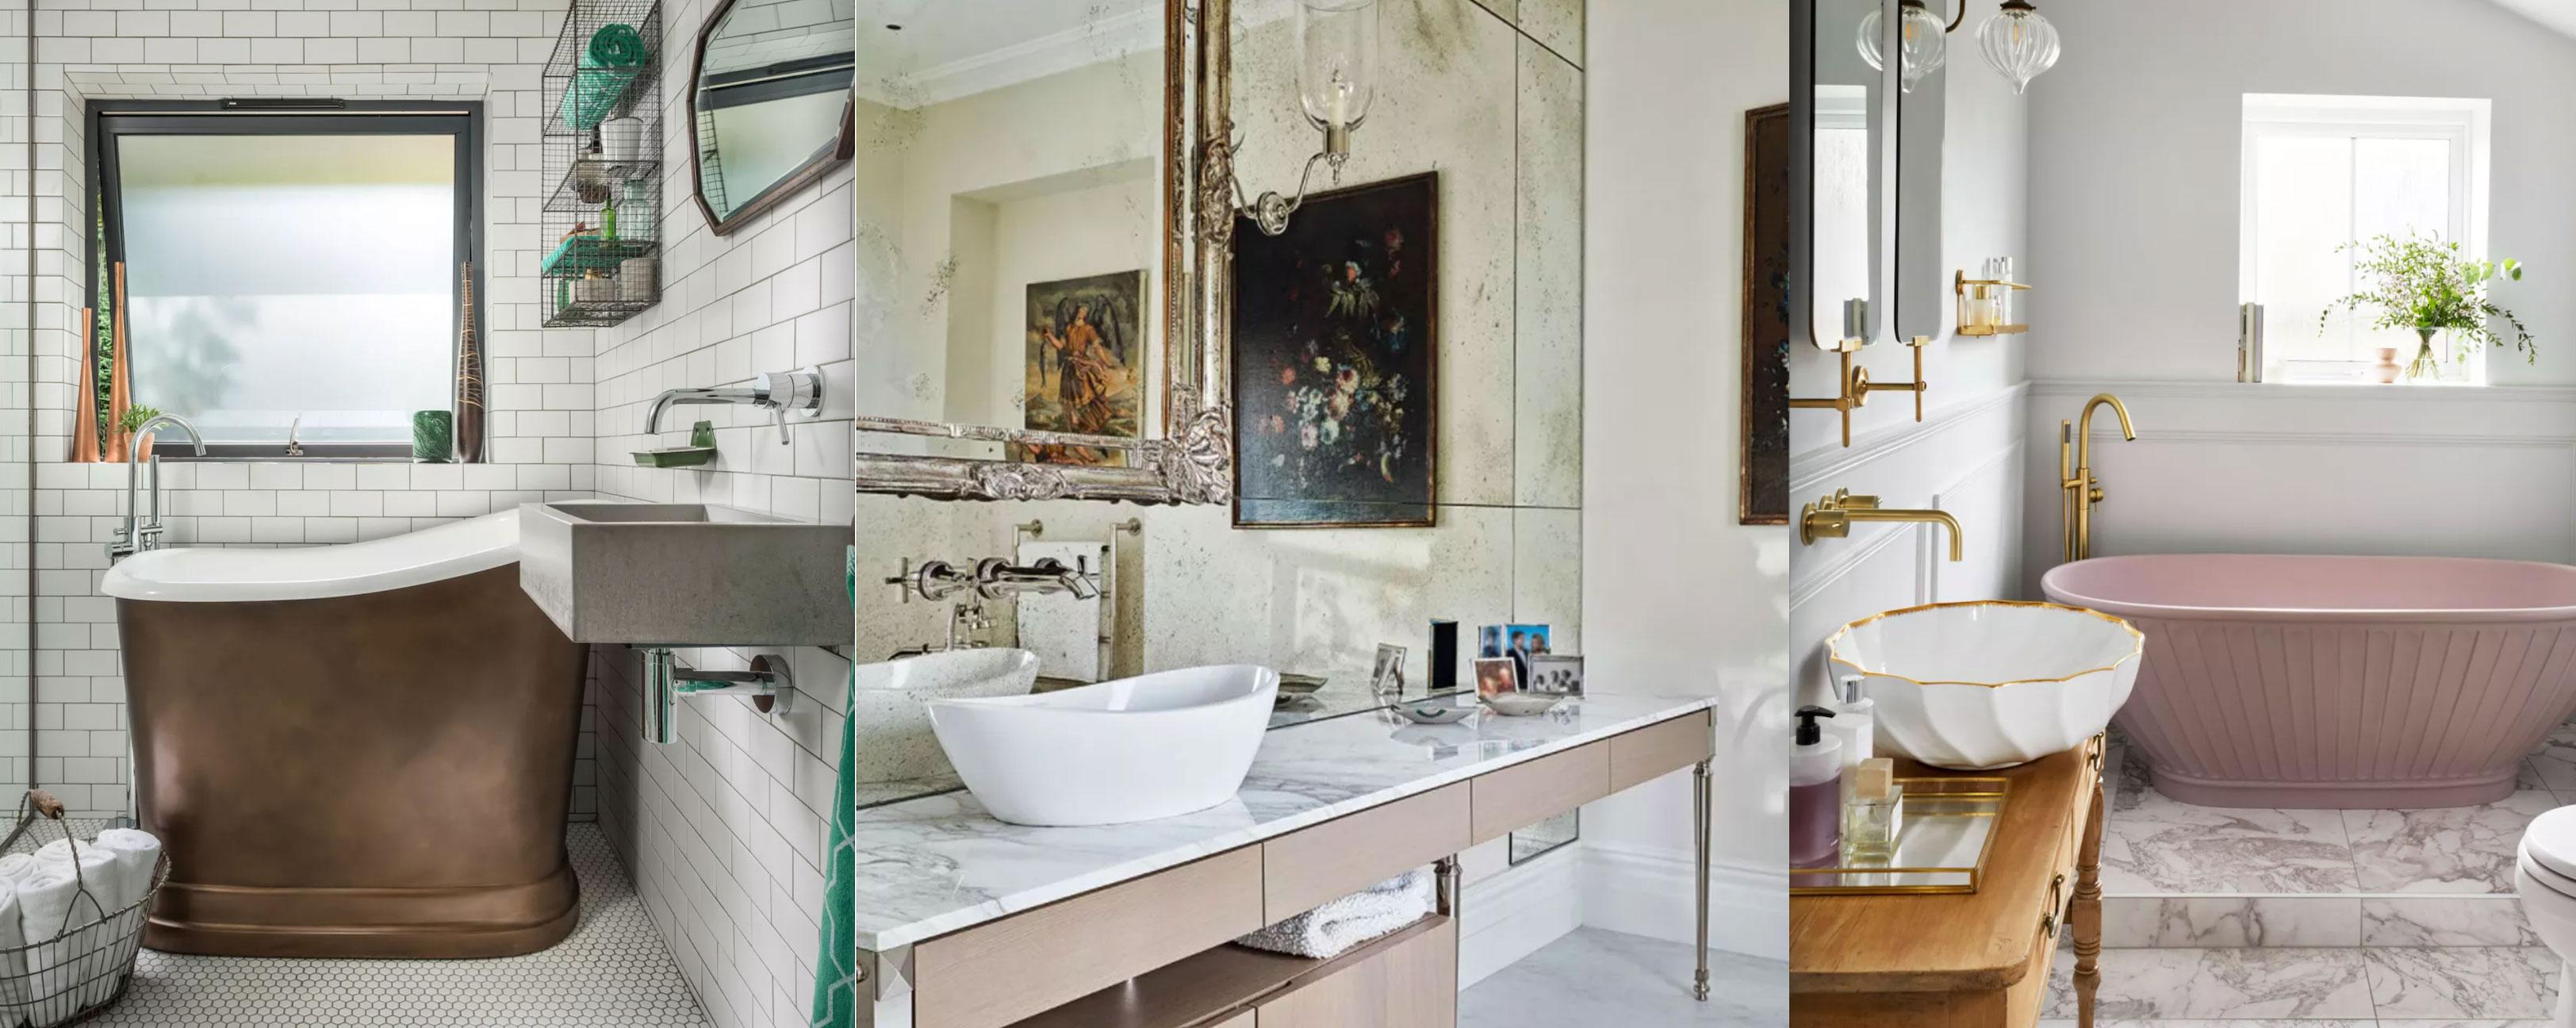 50 Small Bathroom Ideas Solutions For, Small Bathroom Decorating